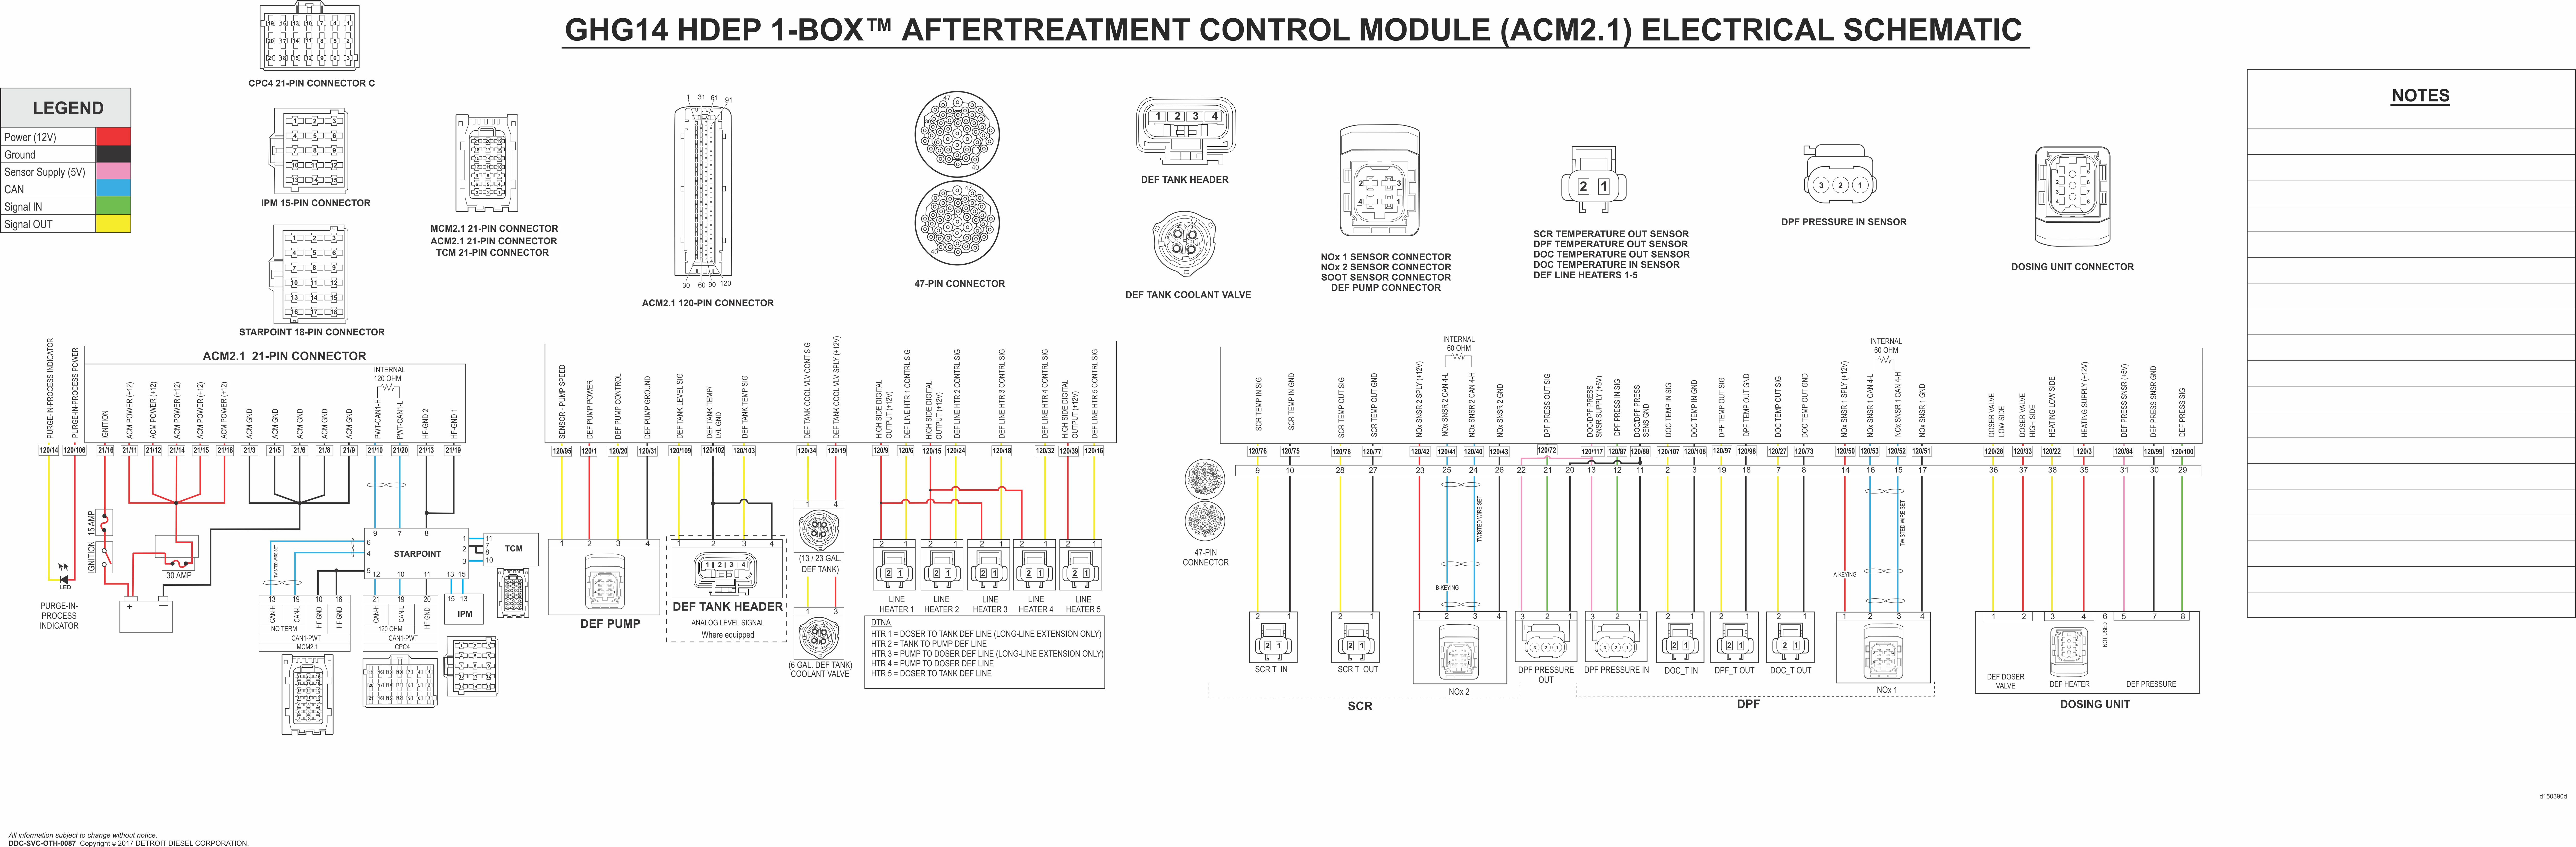 Strange Ghg14 Amc Wiring Diagram Dd15 Troubleshooting Wiring Cloud Monangrecoveryedborg